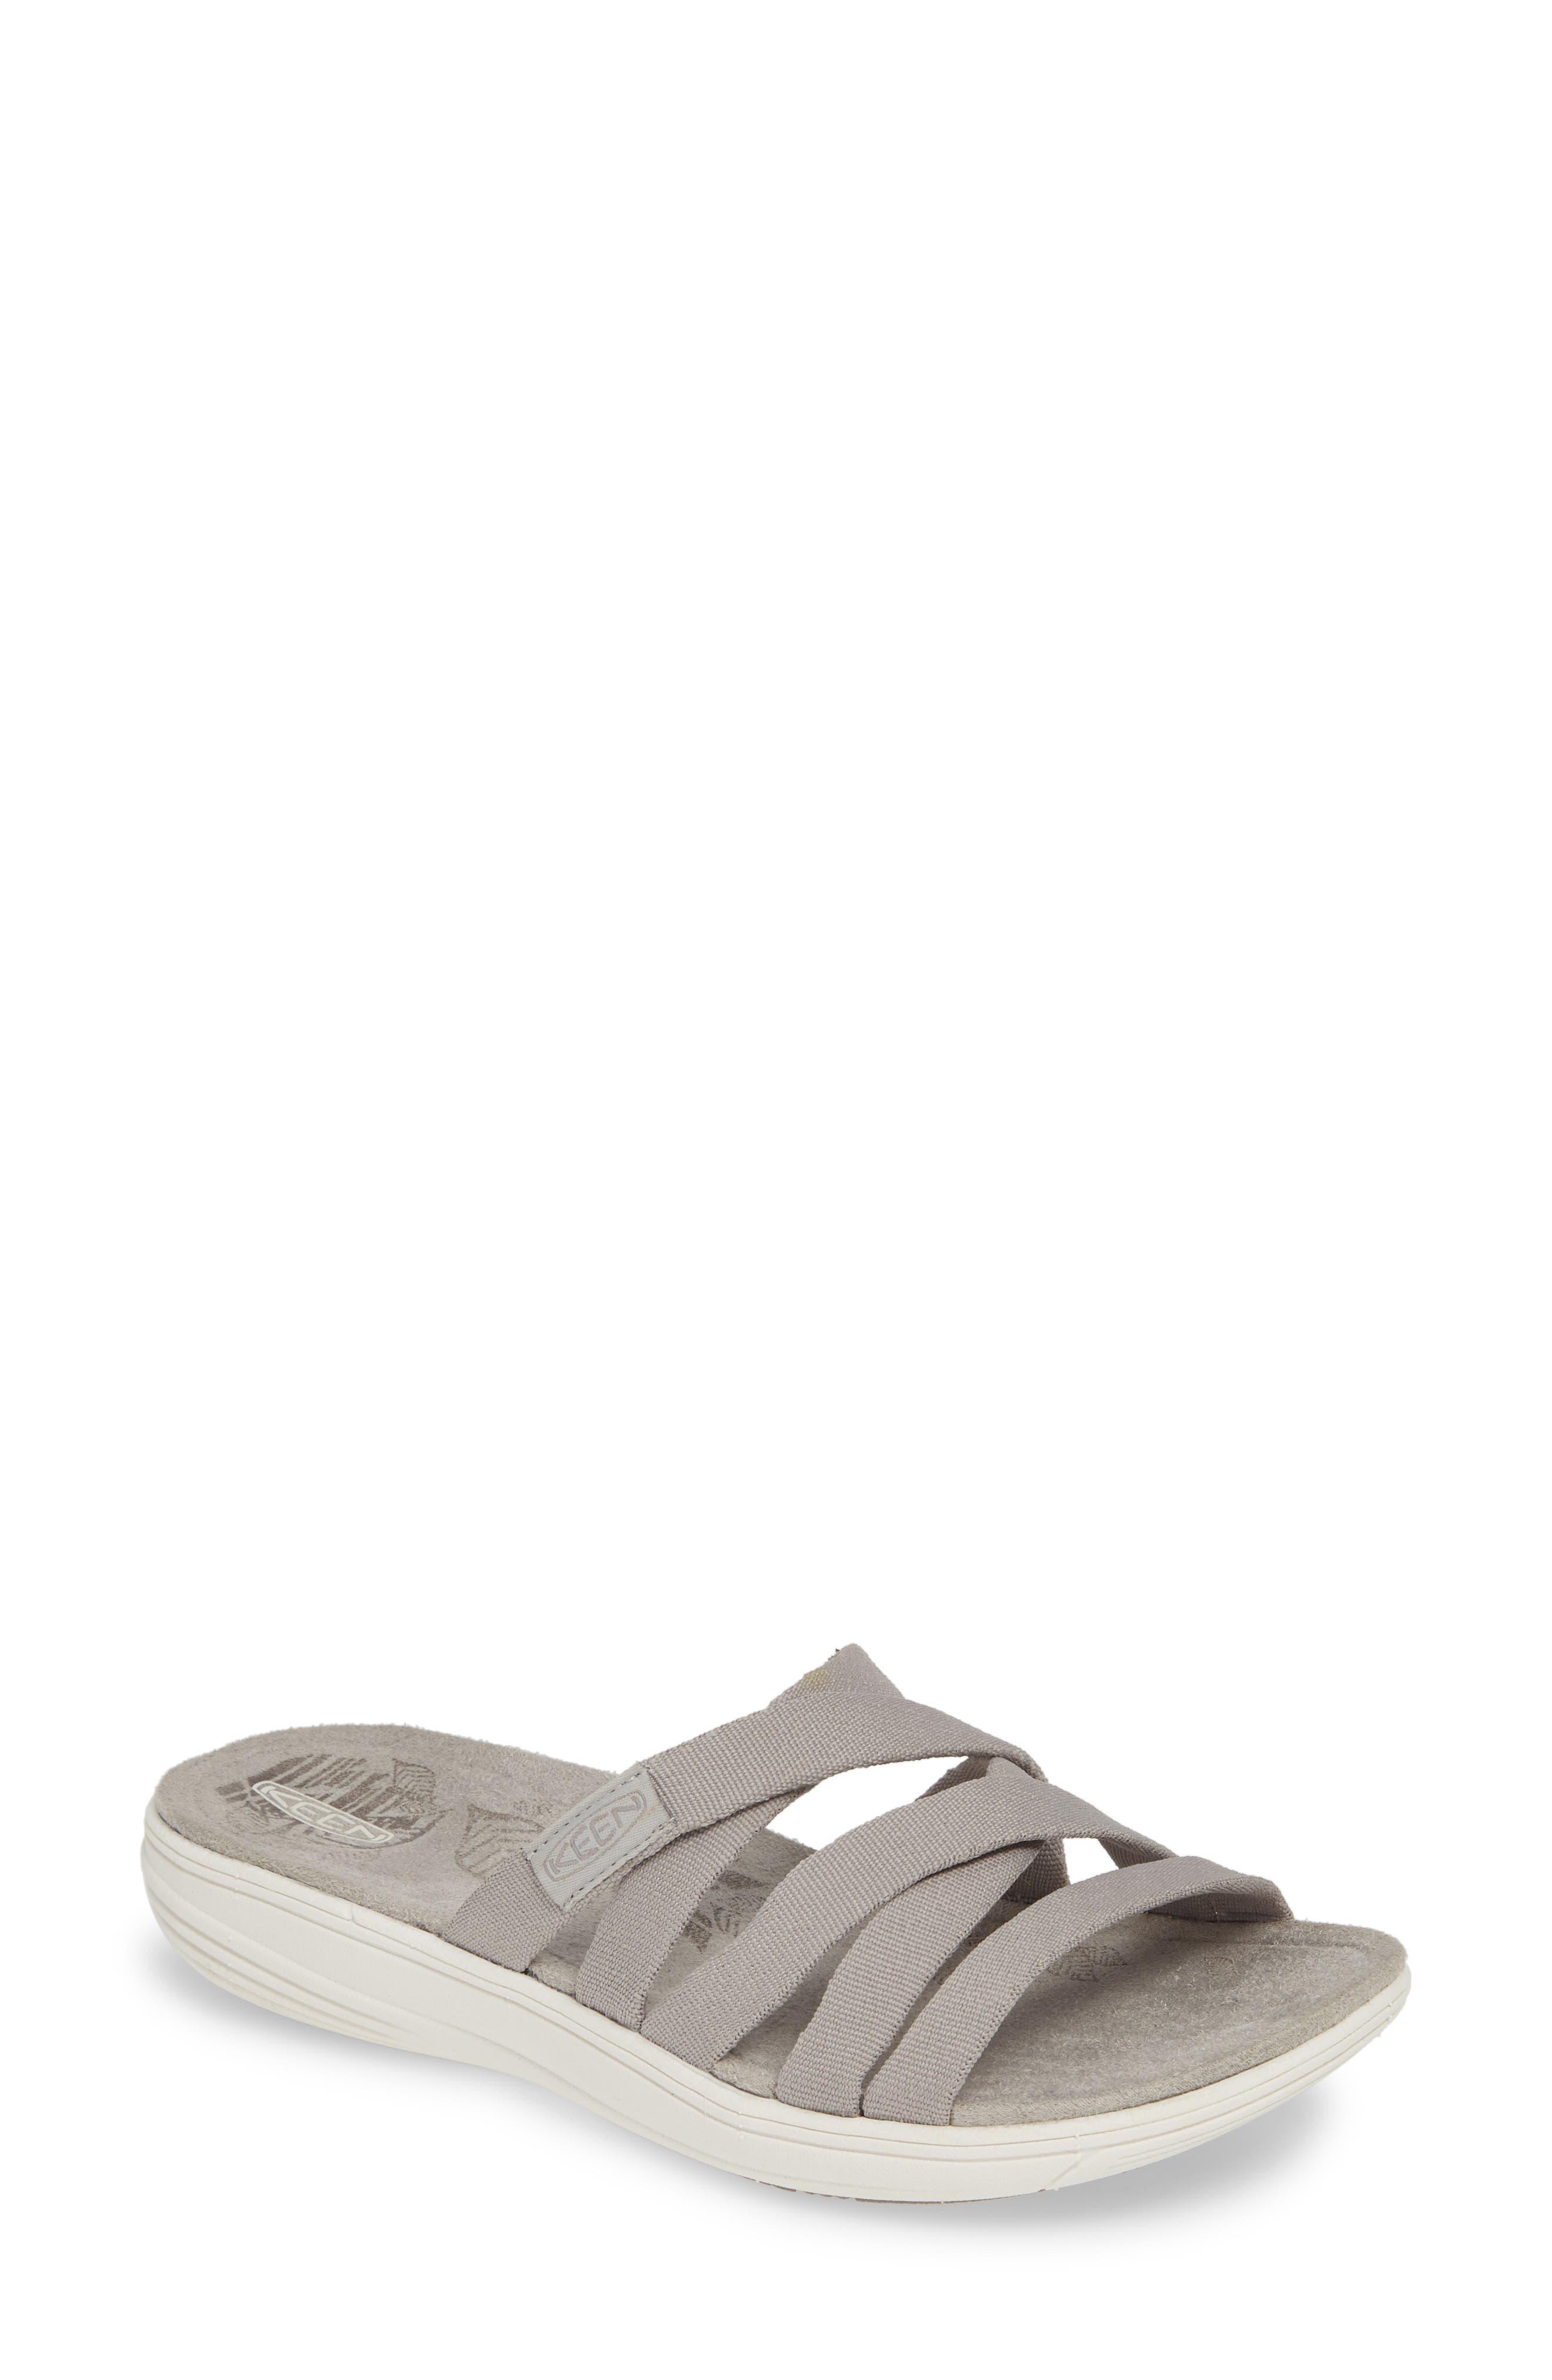 Keen Damaya Slide Sandal, Grey